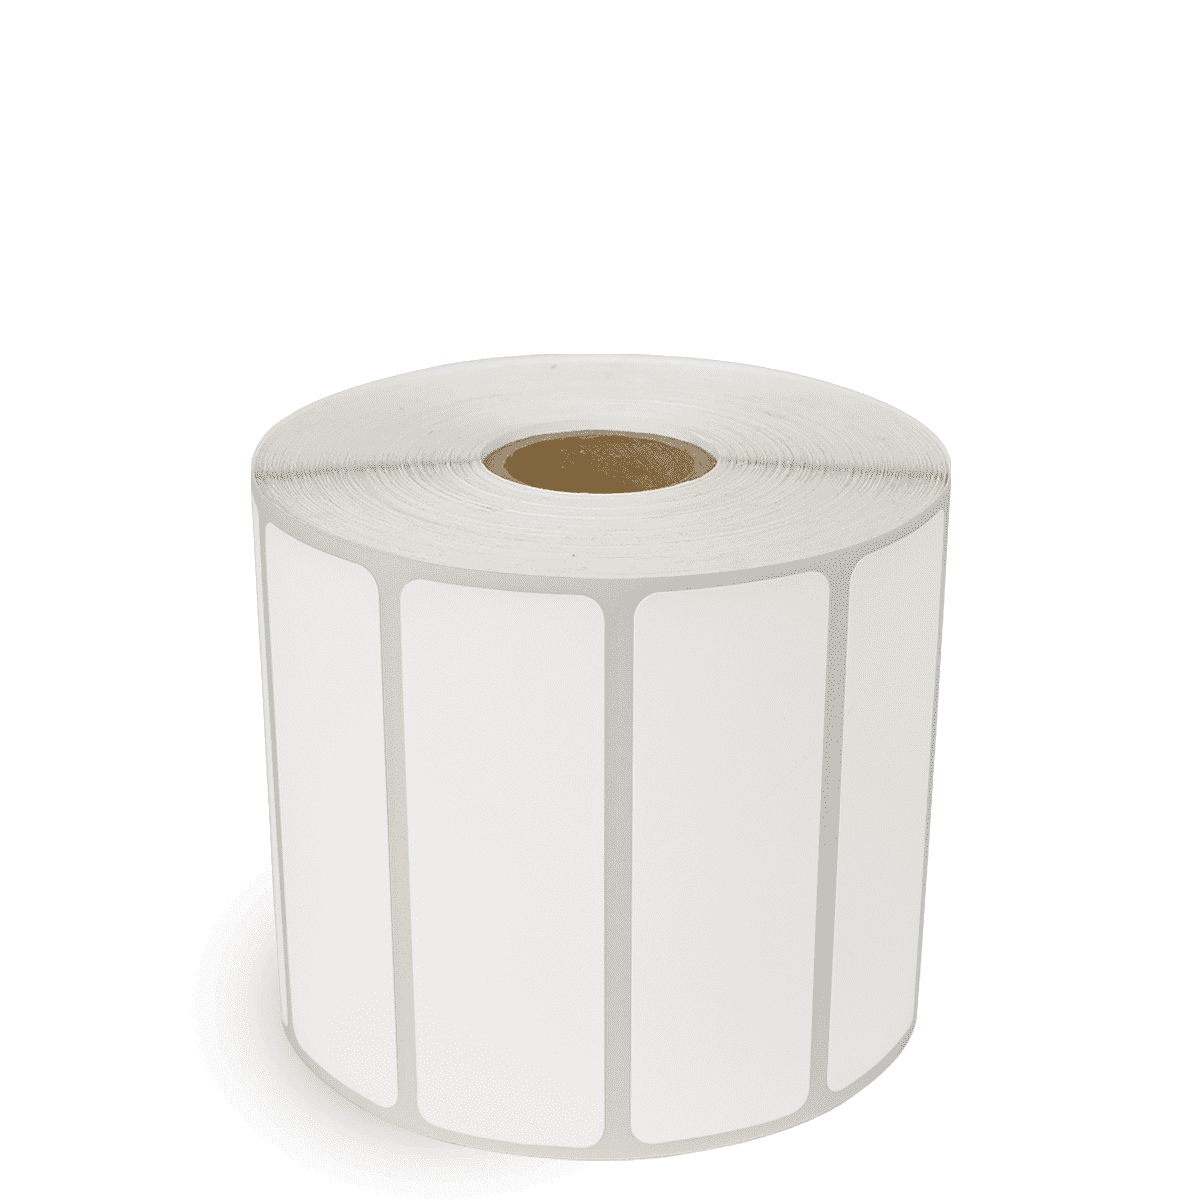 "3"" x 1"" White Matte Paper - Thermal Transfer Labels - 1"" Core"